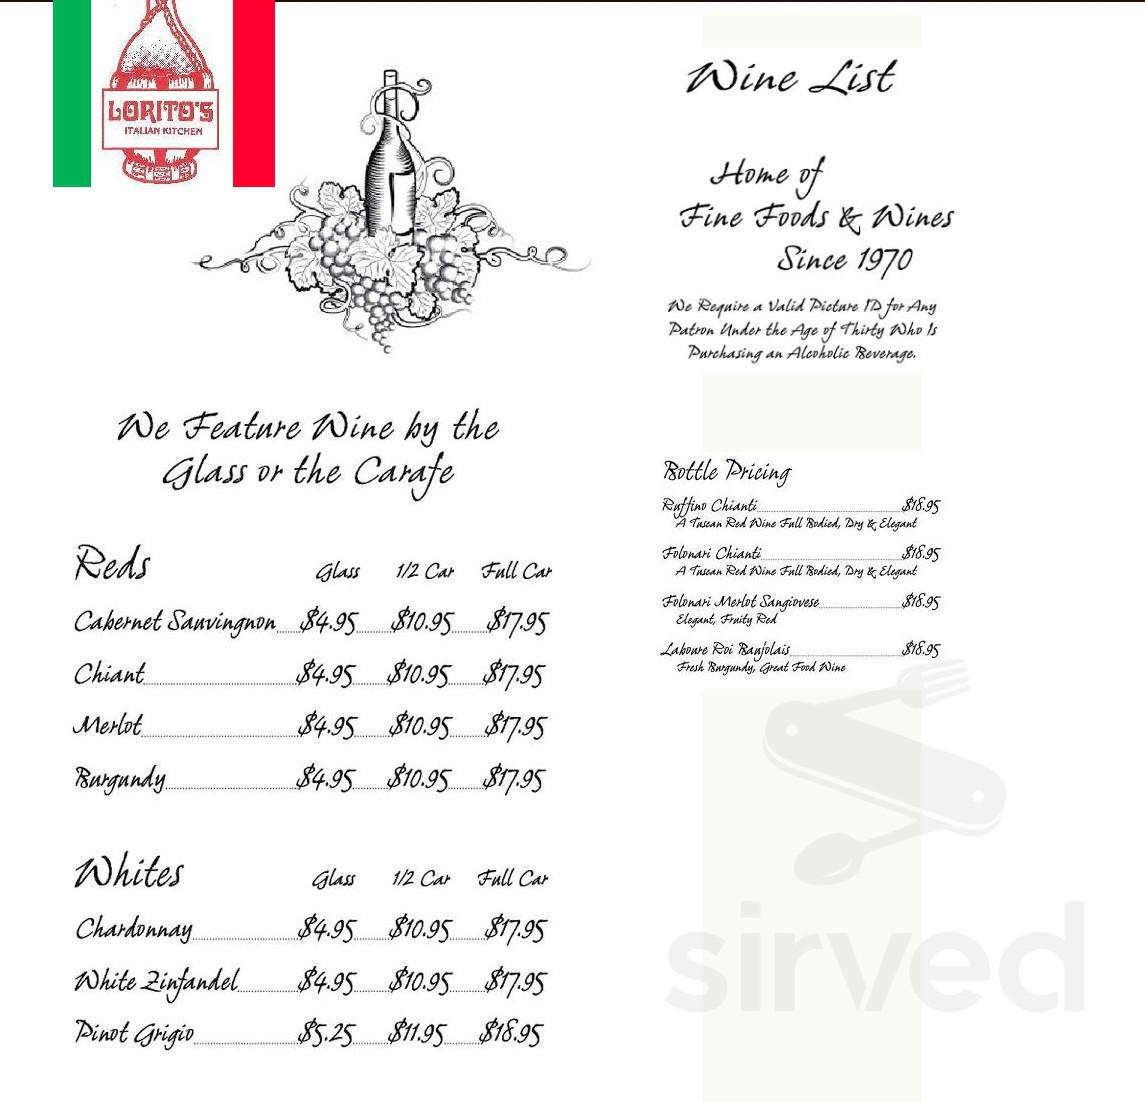 Lorito S Italian Kitchen Menu In Ocala Florida Usa